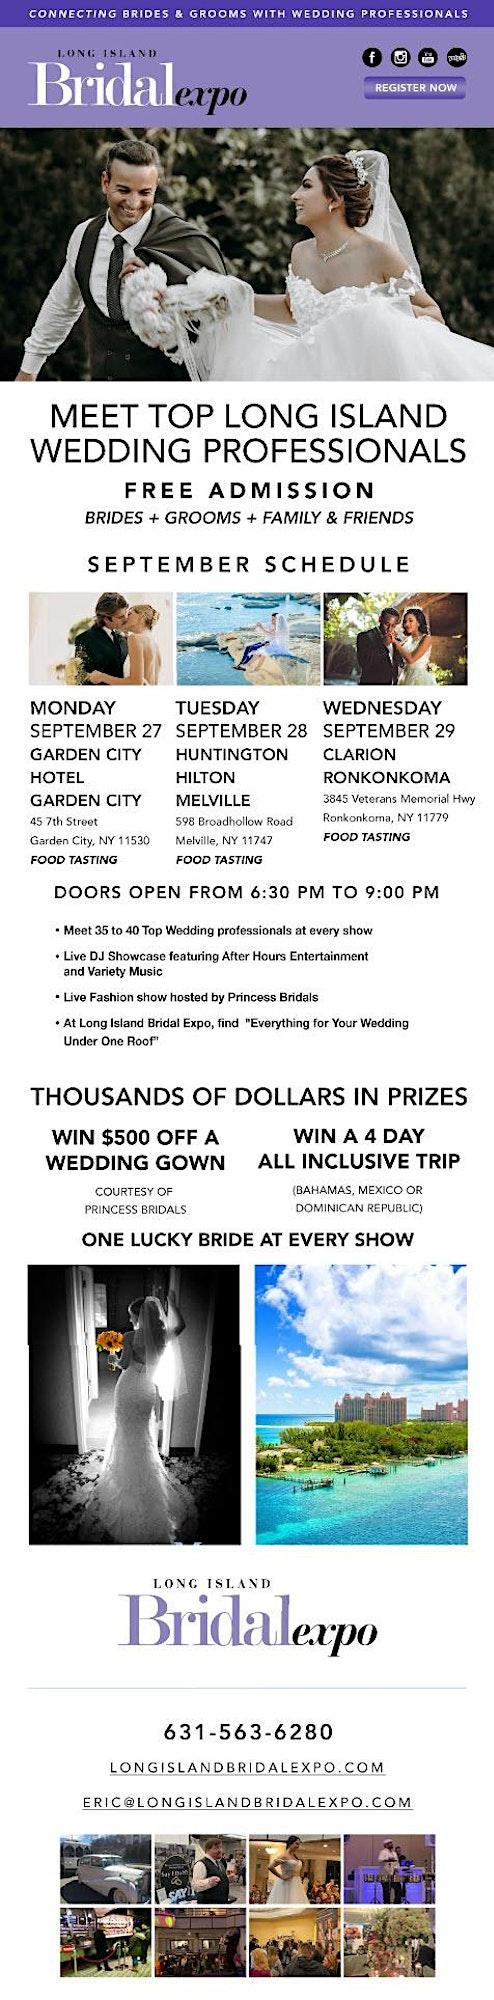 Long Island Bridal Expo-September 2021 image